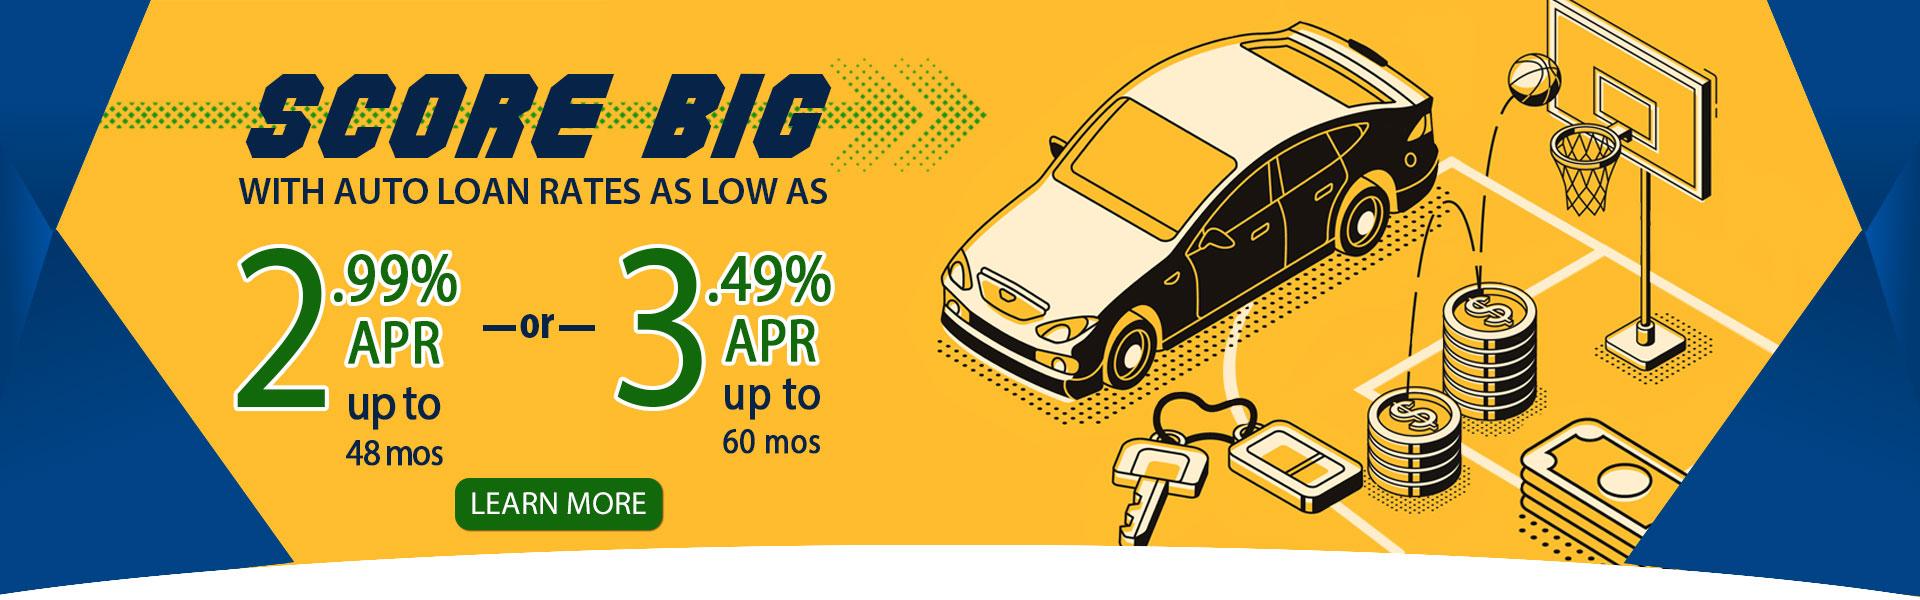 2.99% APR Auto Loans